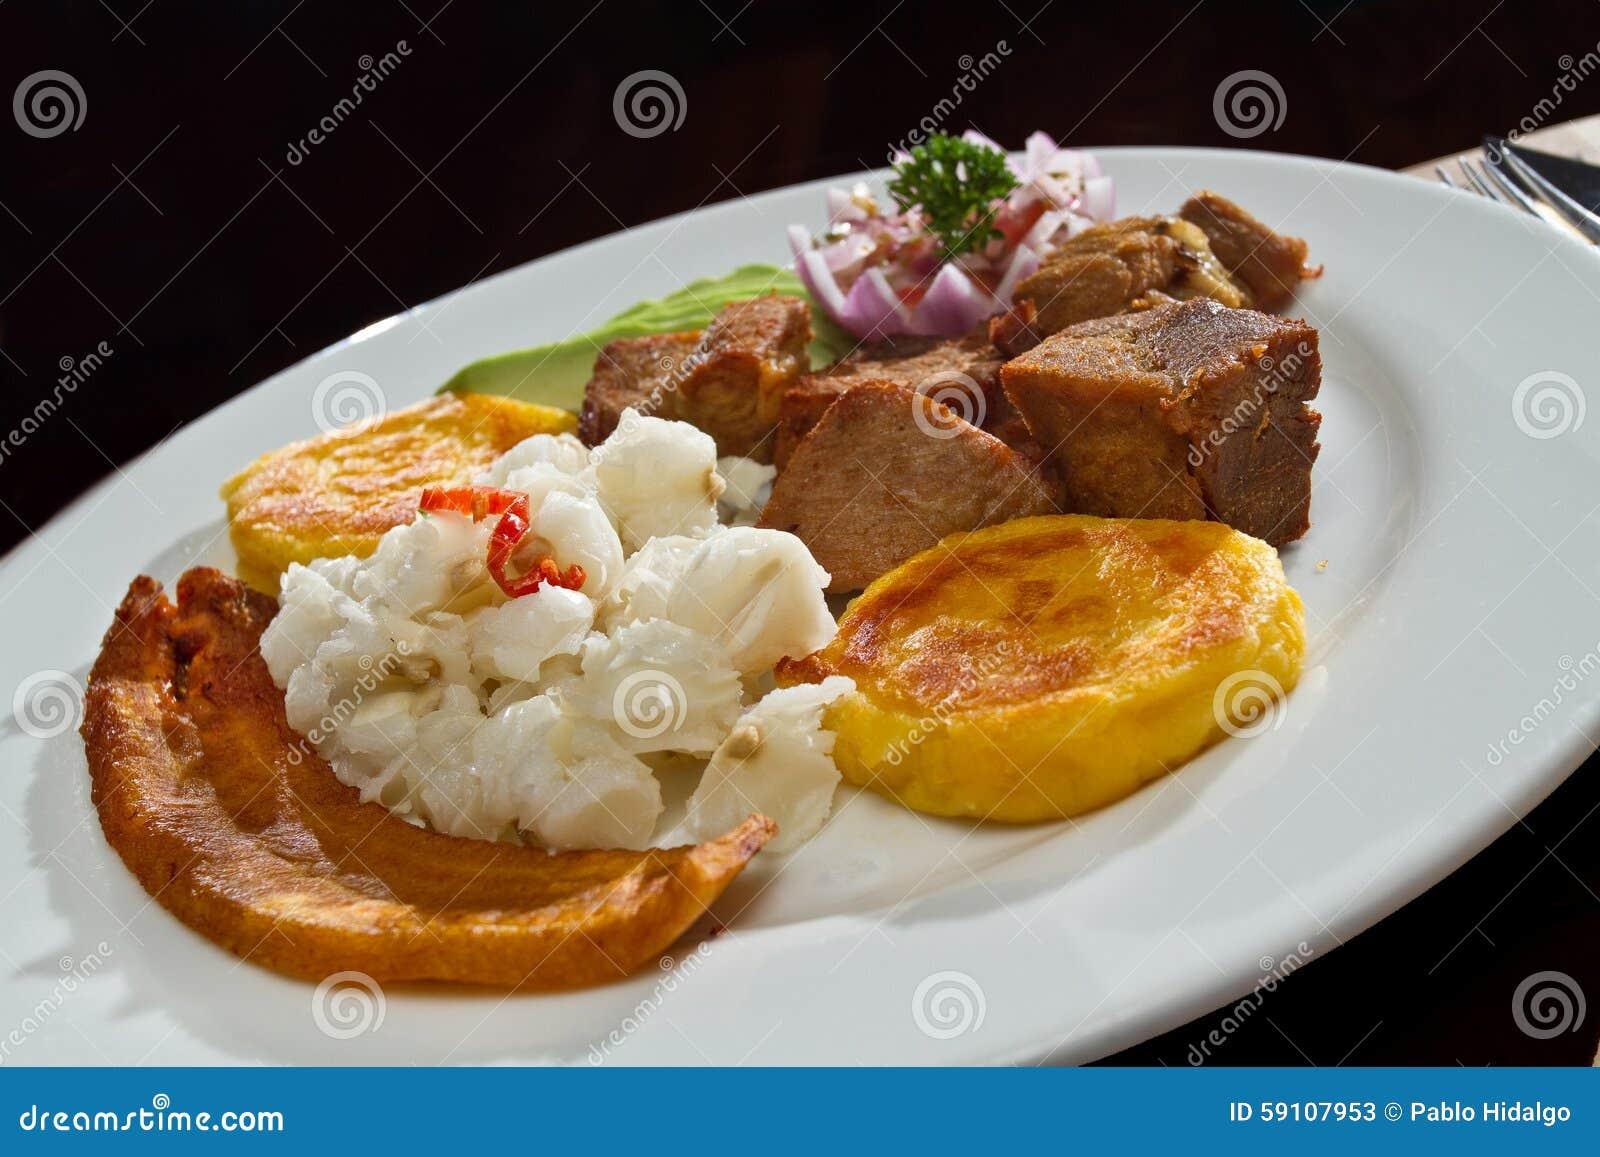 Fritada,油煎的猪肉,典型的厄瓜多尔食物